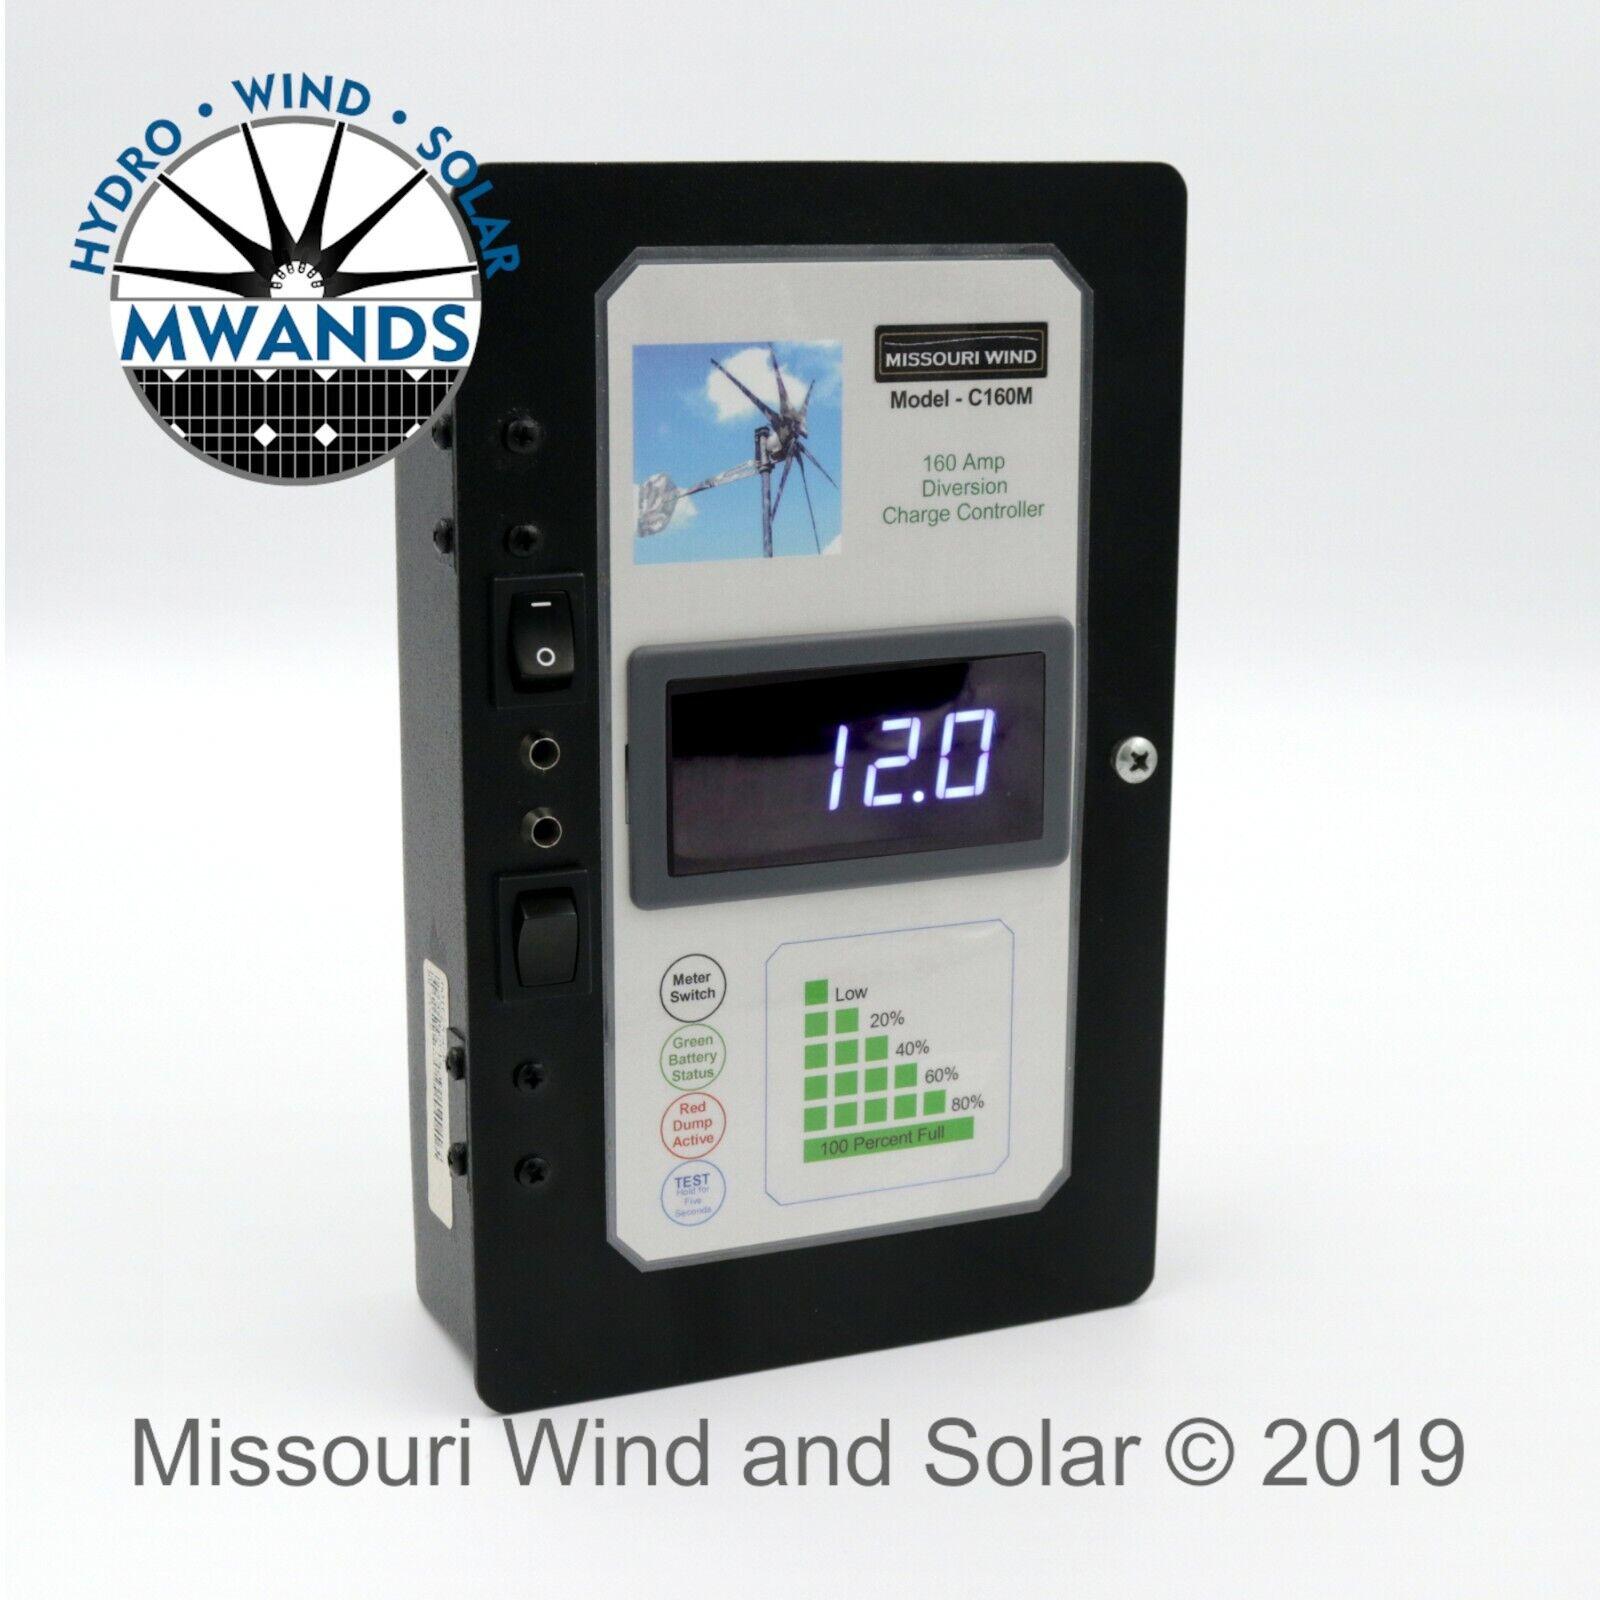 160 Amp 3600 Watt Hybrid Charge Controller For 12 24 Volt